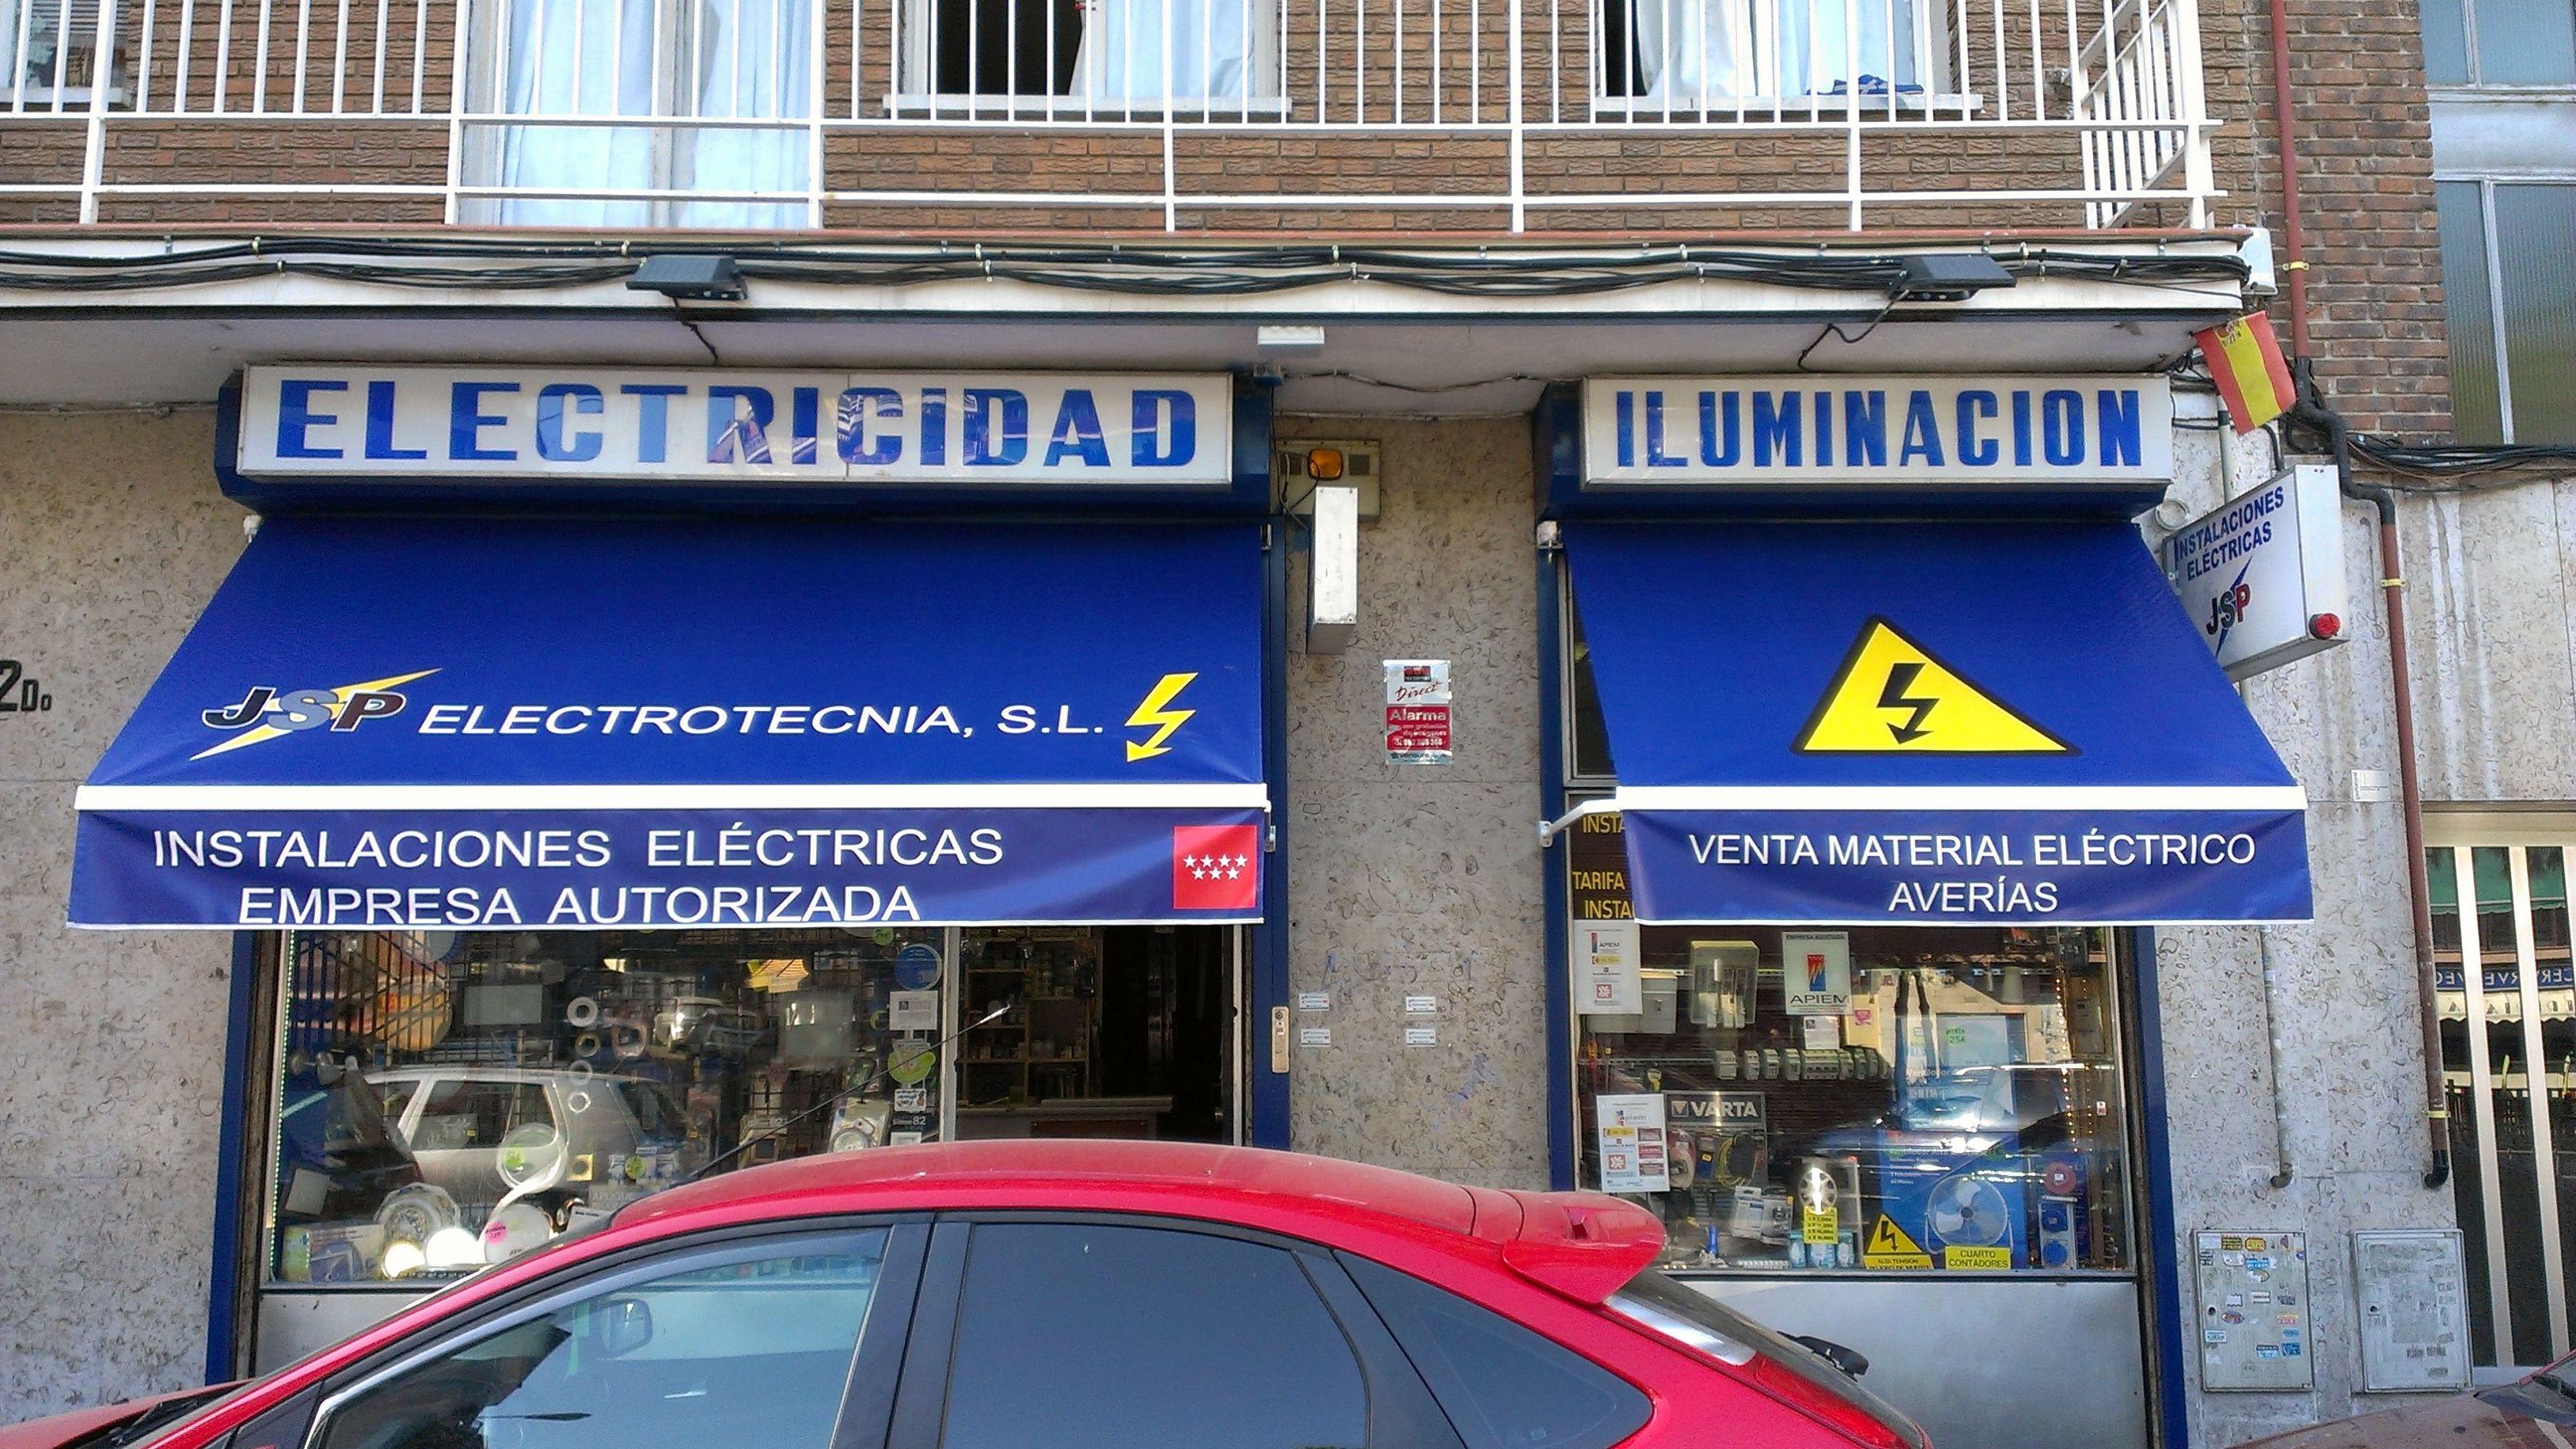 Foto 9 de Electricidad en Madrid | Jsp Electrotecnia, S.L.